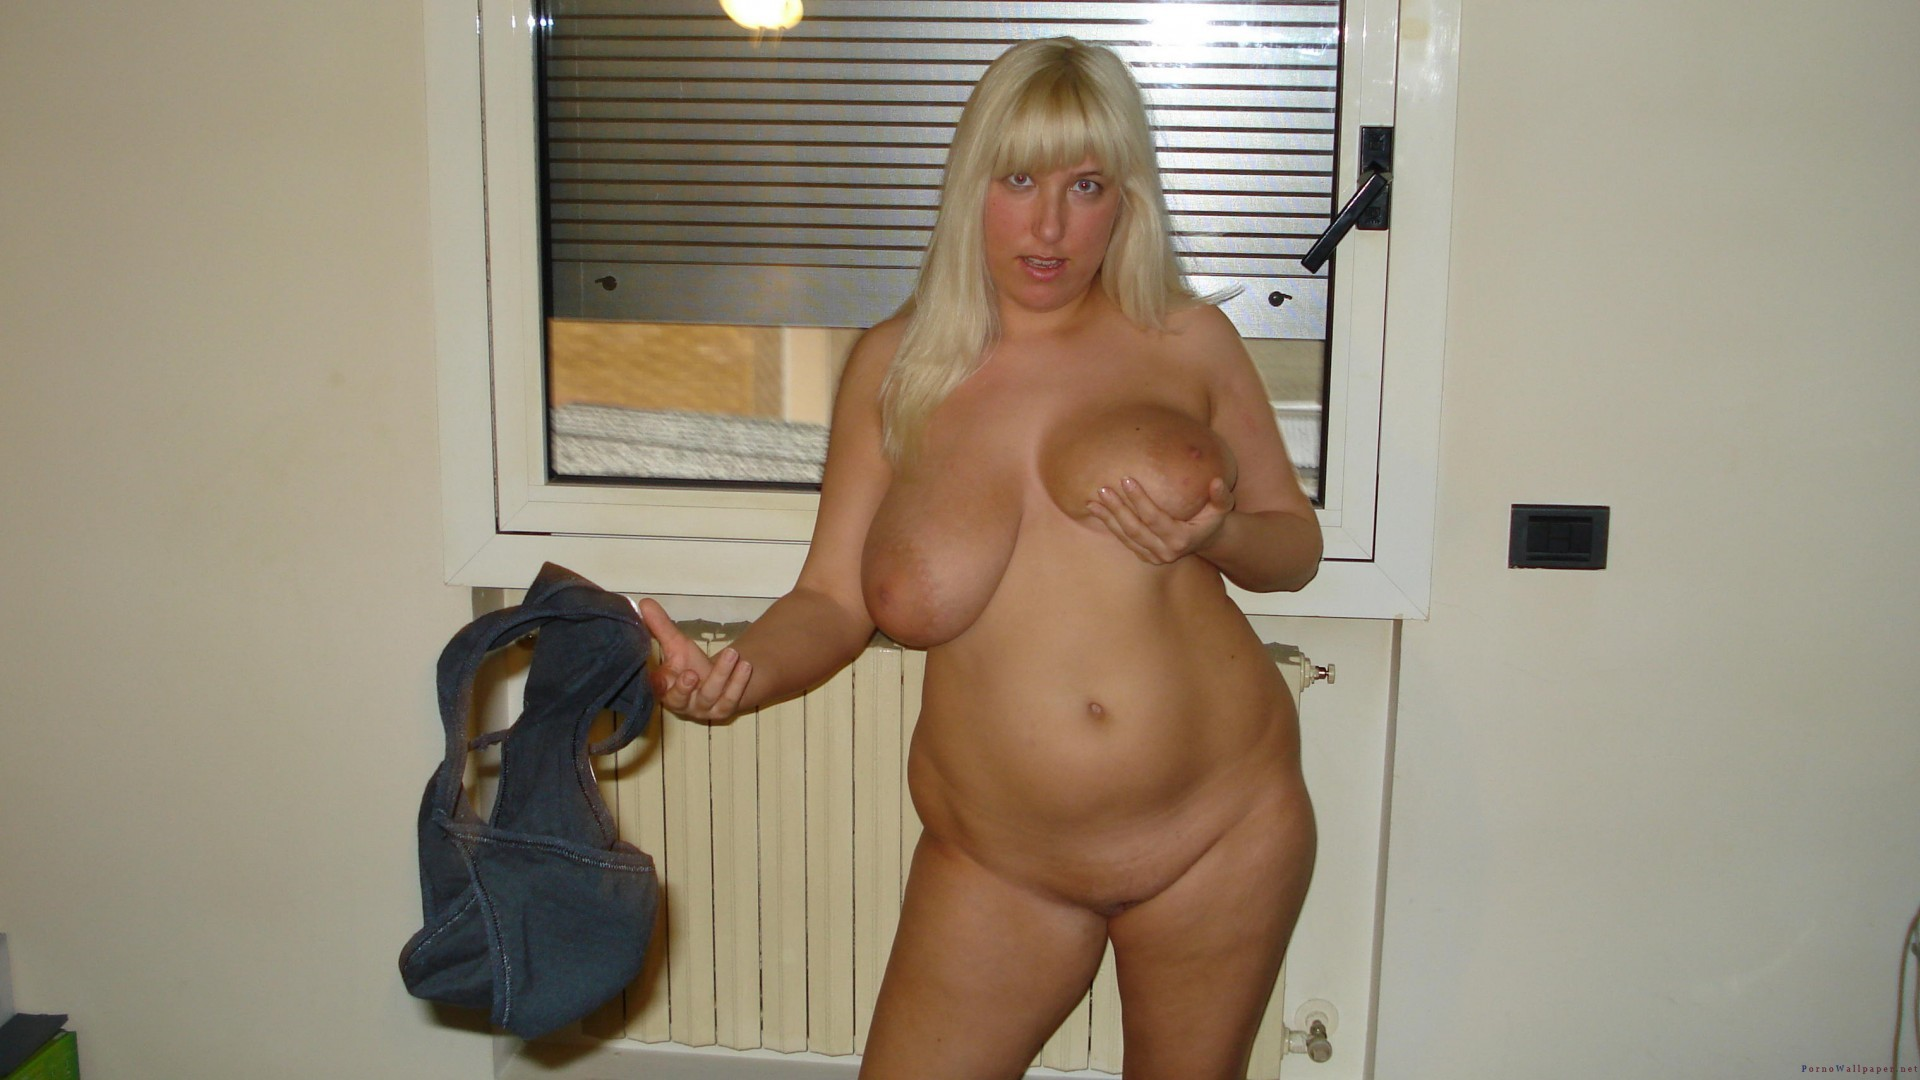 Hd фото голых толстых женщин